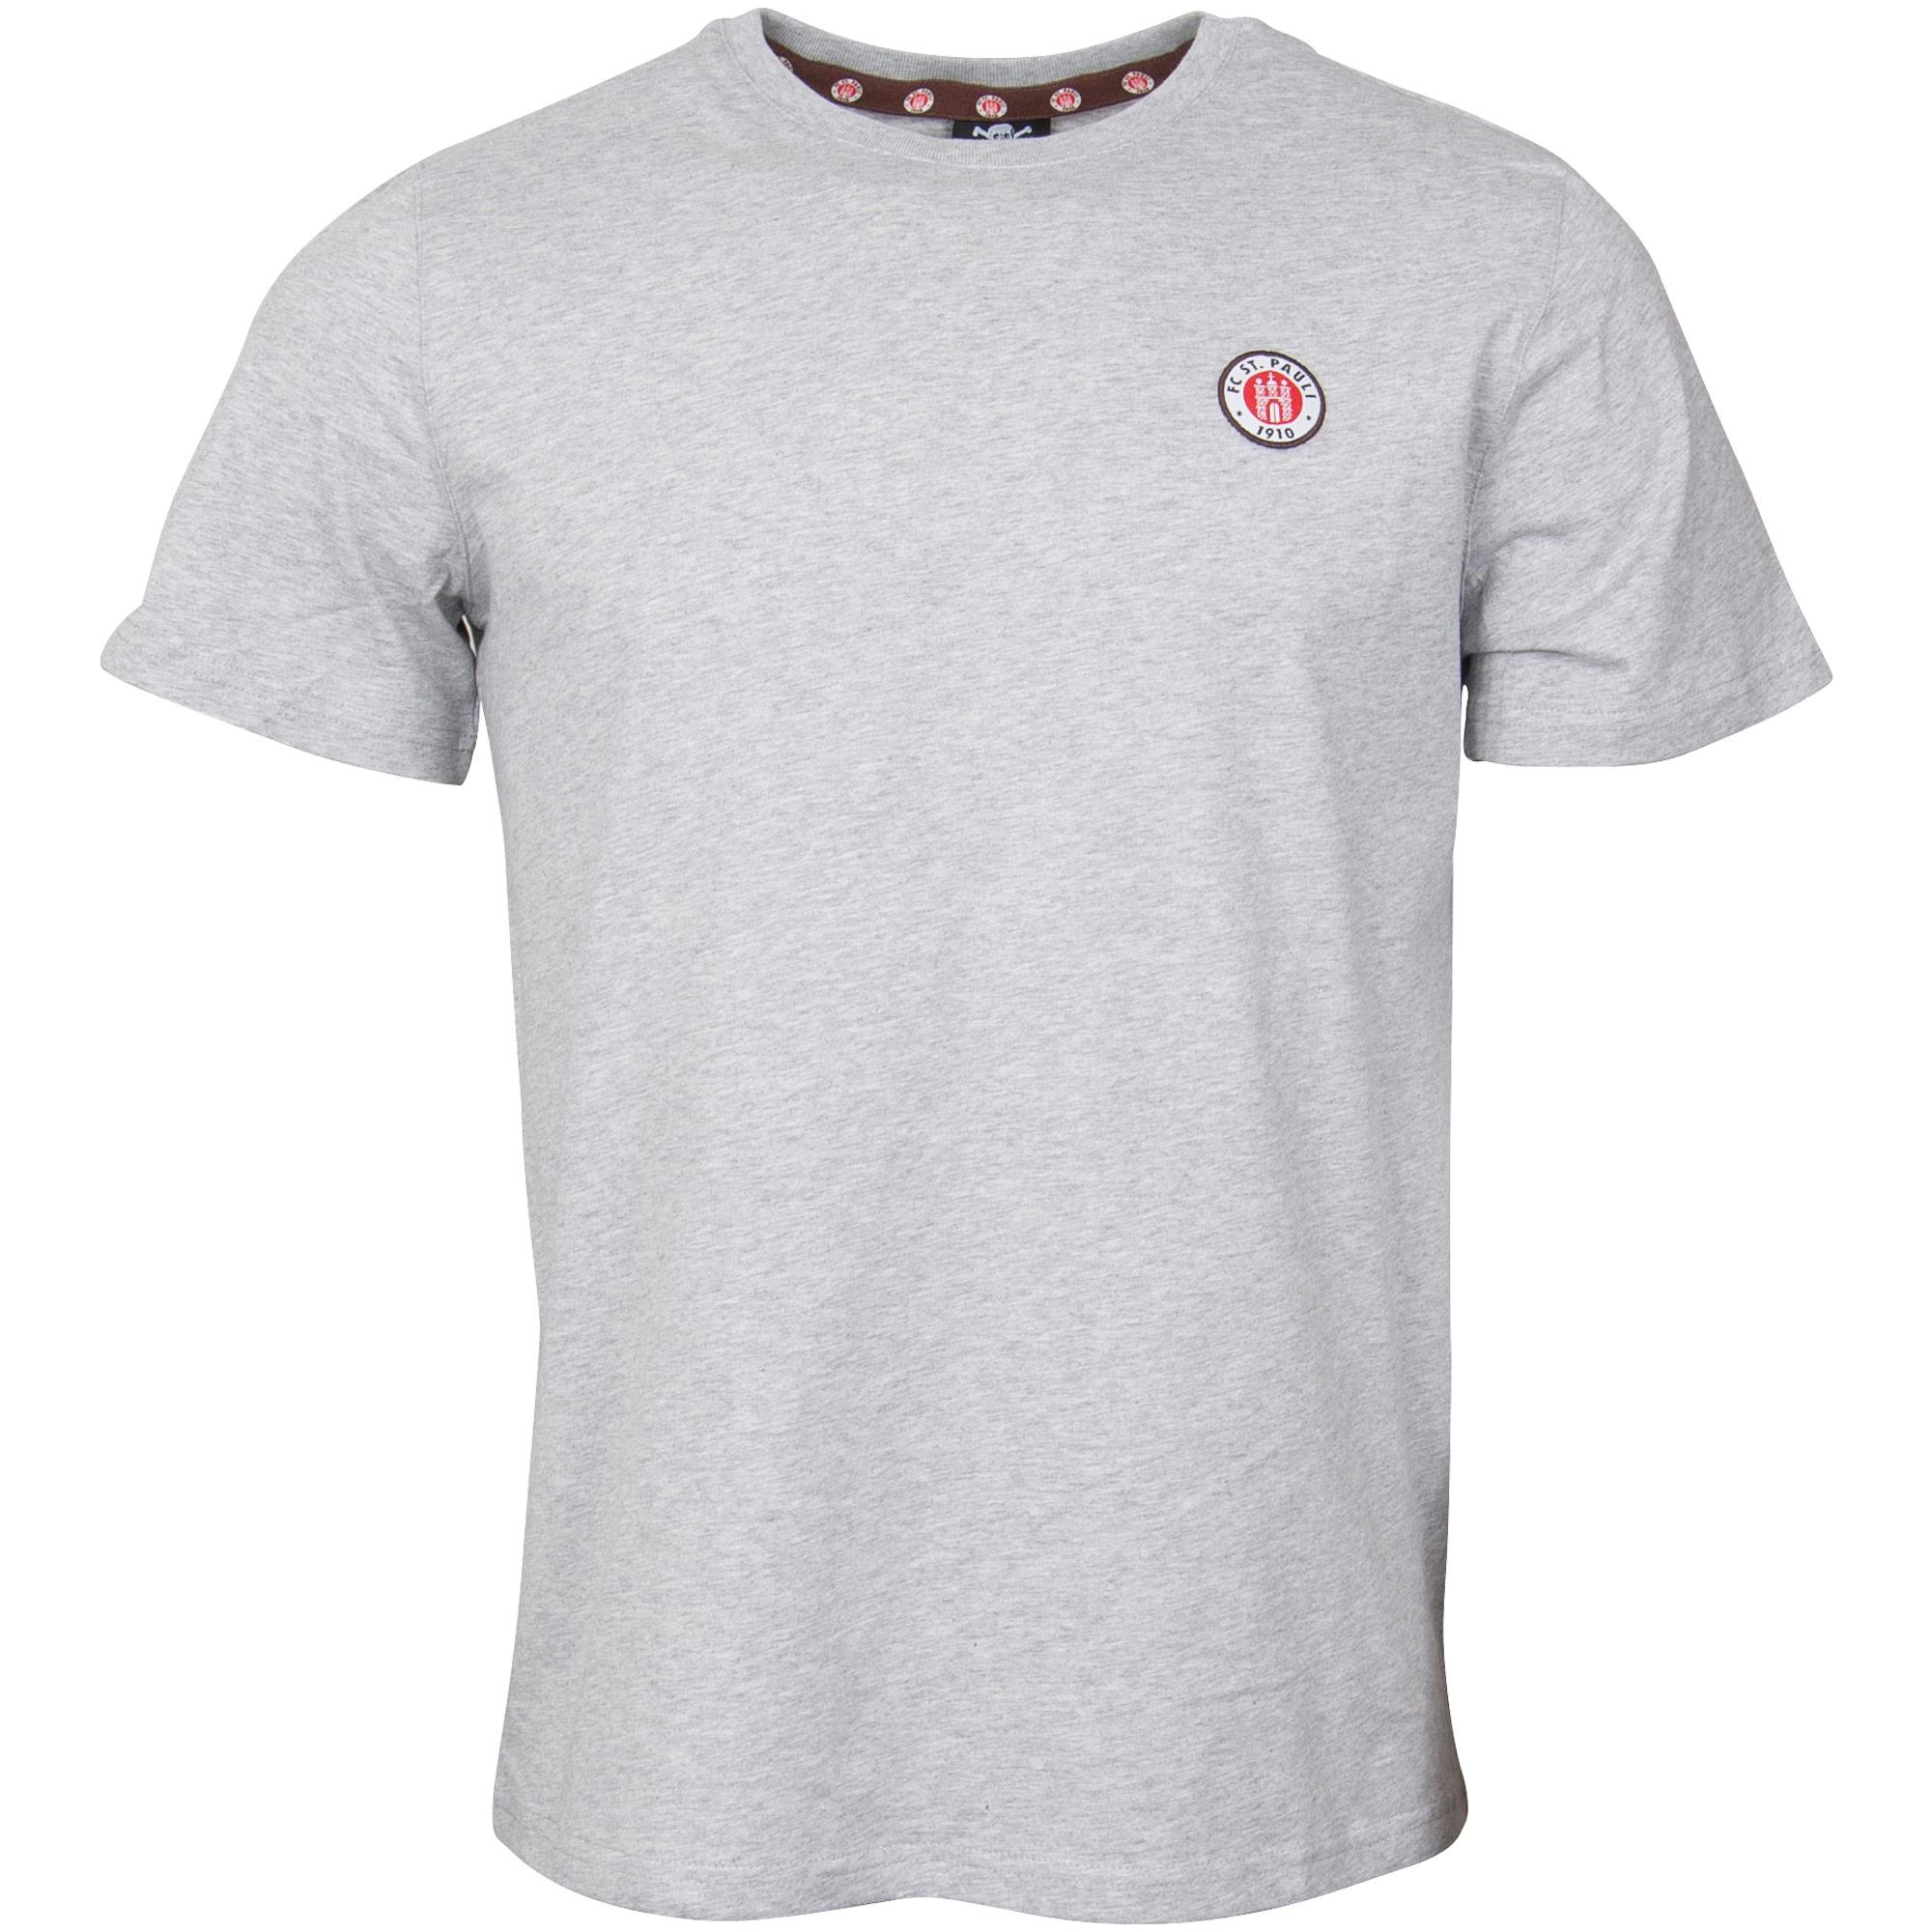 FC St. Pauli - T-Shirt Club mit Logo - grau